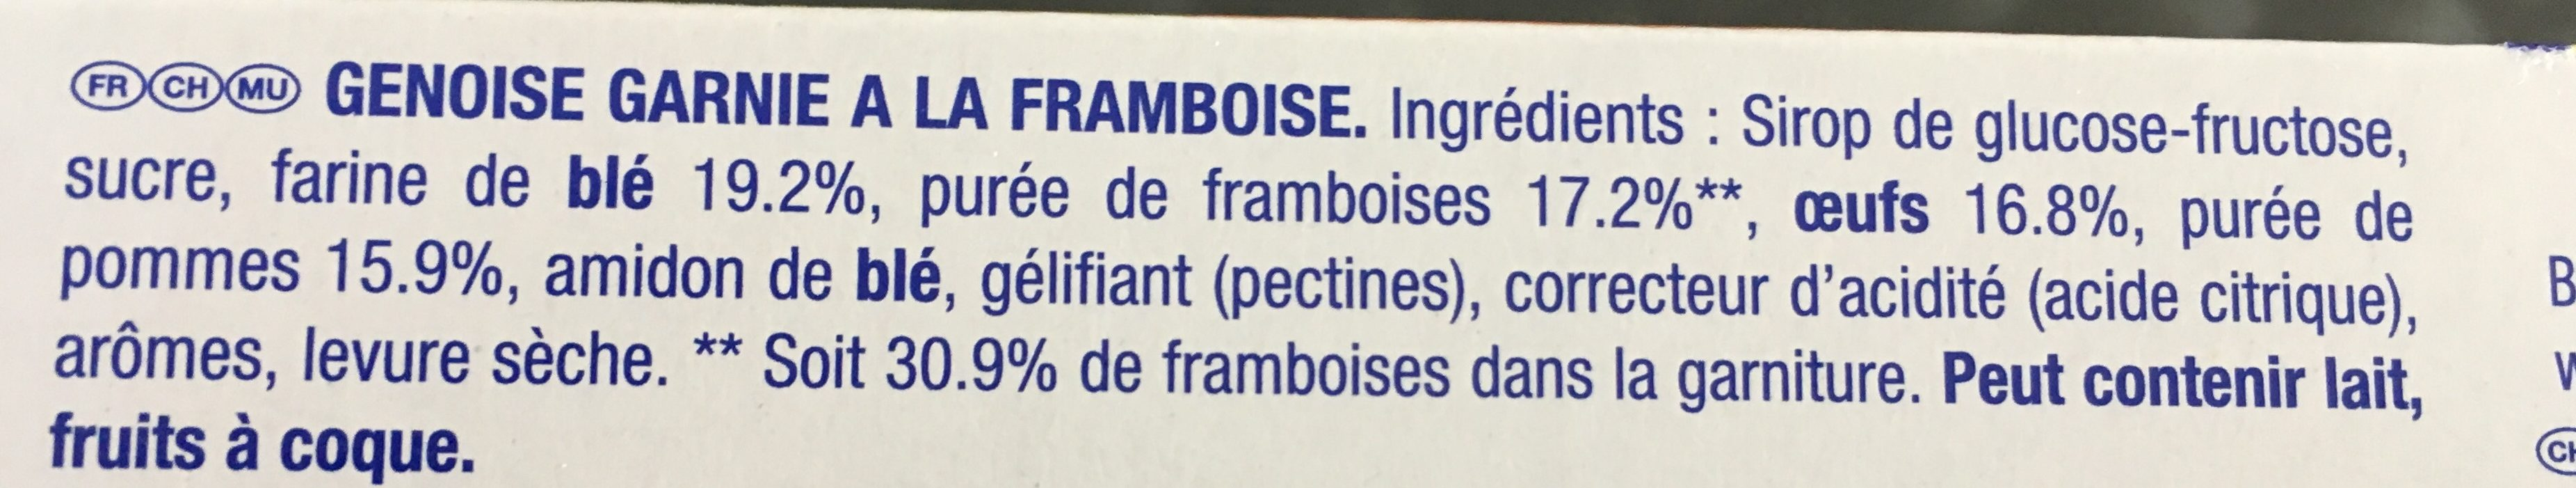 Lulu Barquettes framboise - Ingrédients - fr